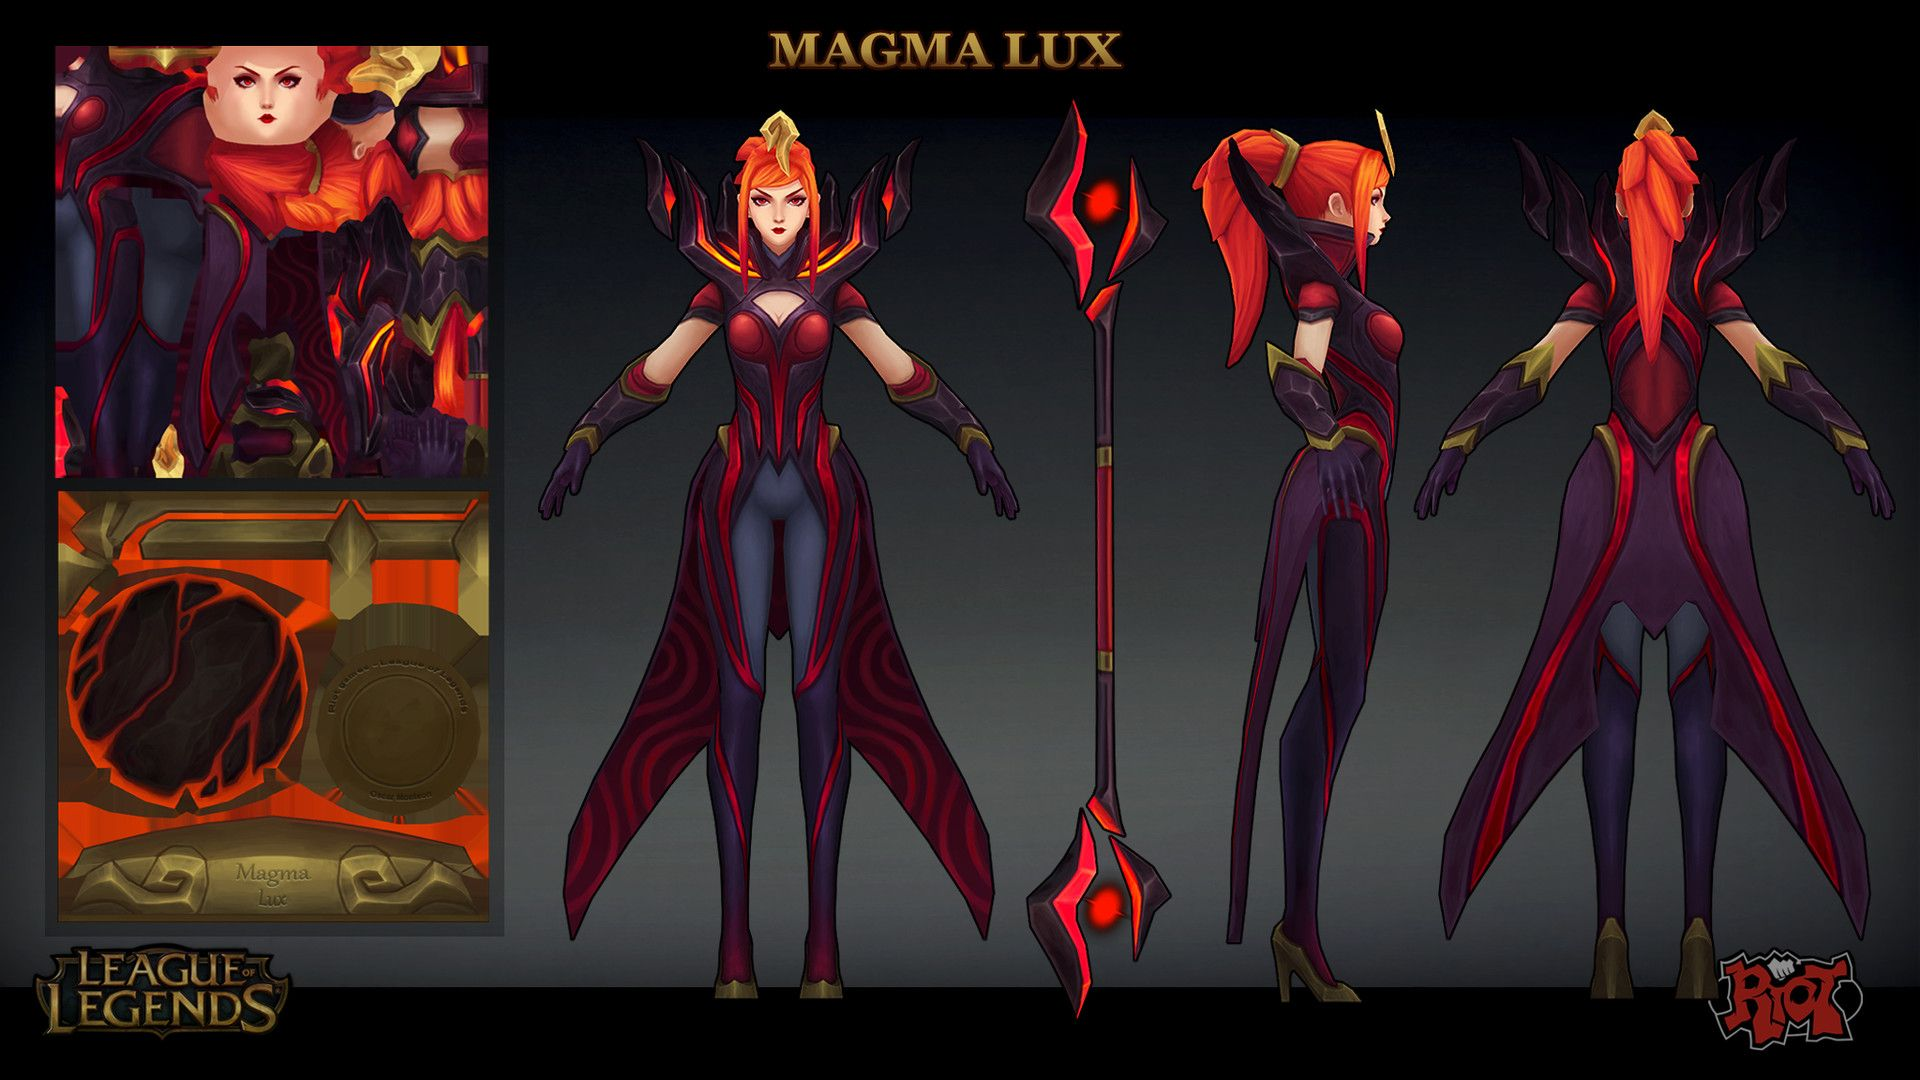 Elementalist Lux League Of Legends 14 Tys Izobrazhenij Najdeno V Yandeks Kartinkah Kunst